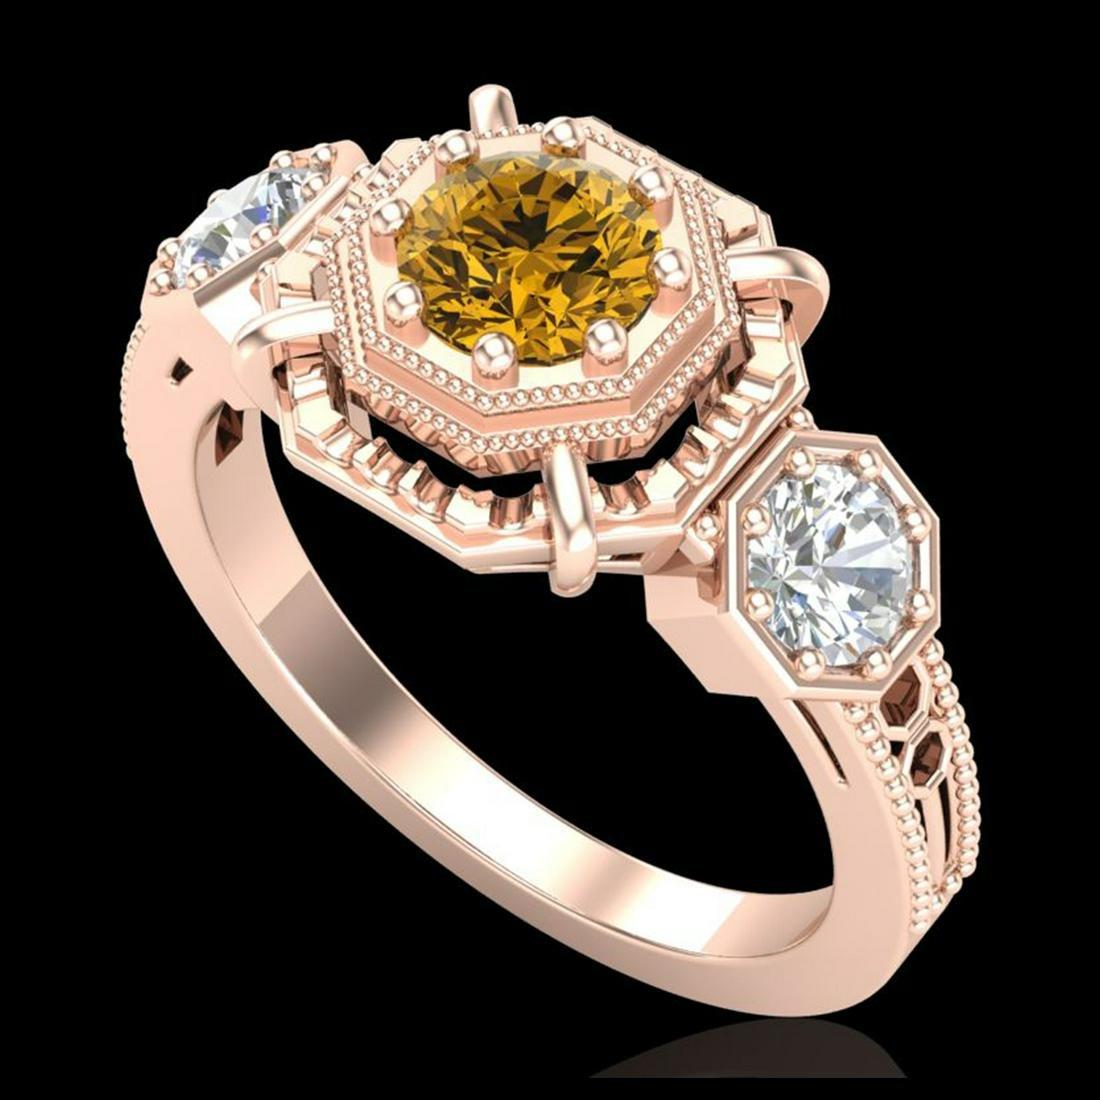 1.01 ctw Intense Fancy Yellow Diamond Art Deco Ring 18K